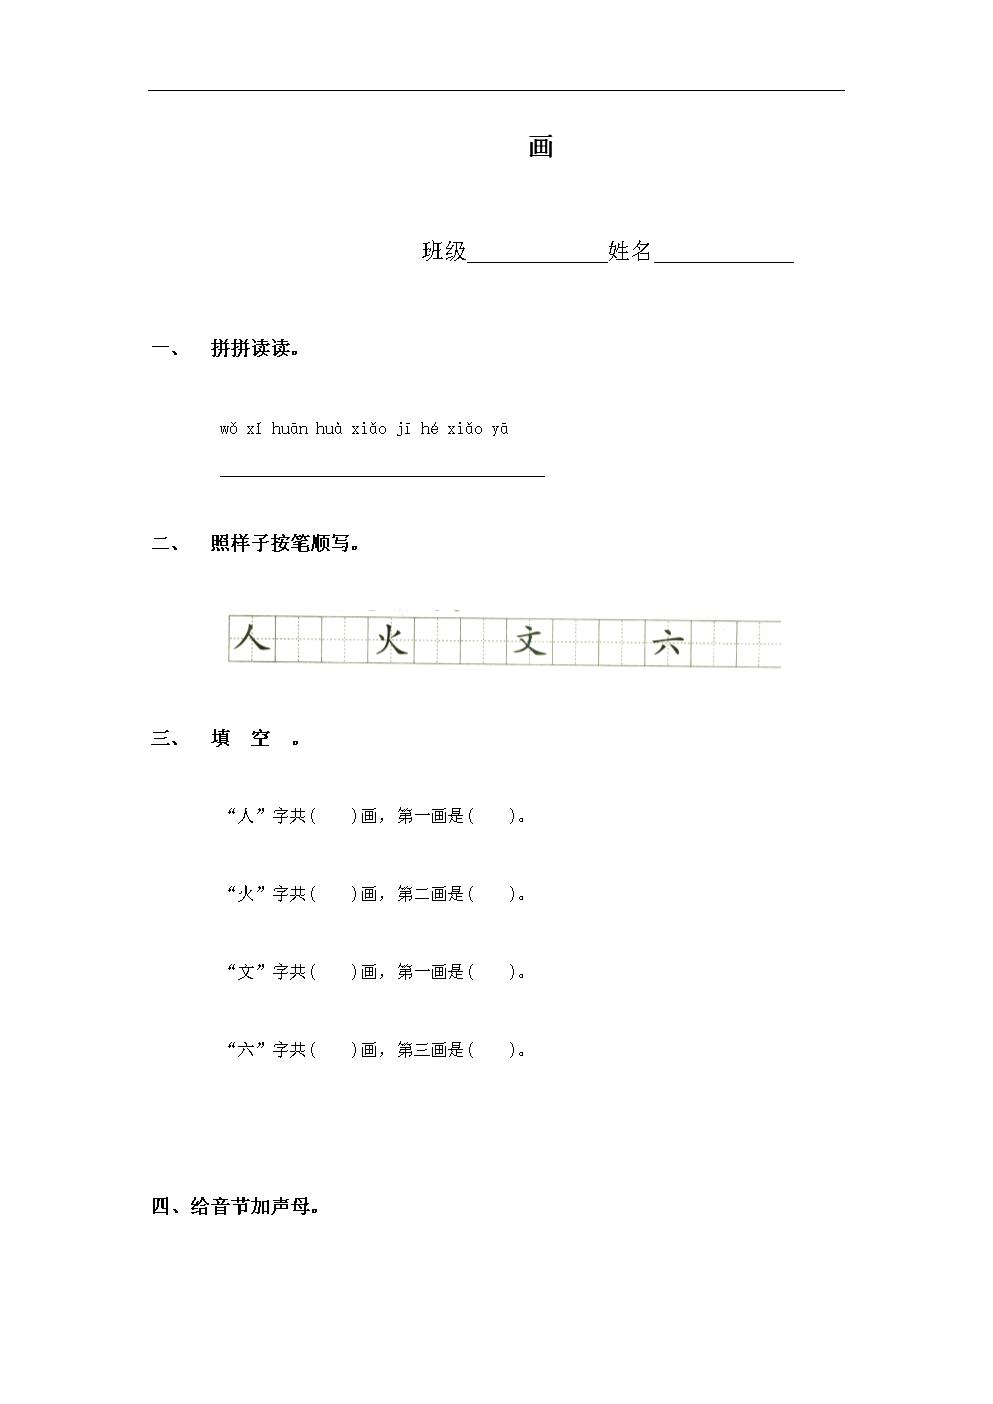 "y的笔画顺序-yā 照样子按笔顺写.填 空 .""人""字共( )画,第一画是( ). """